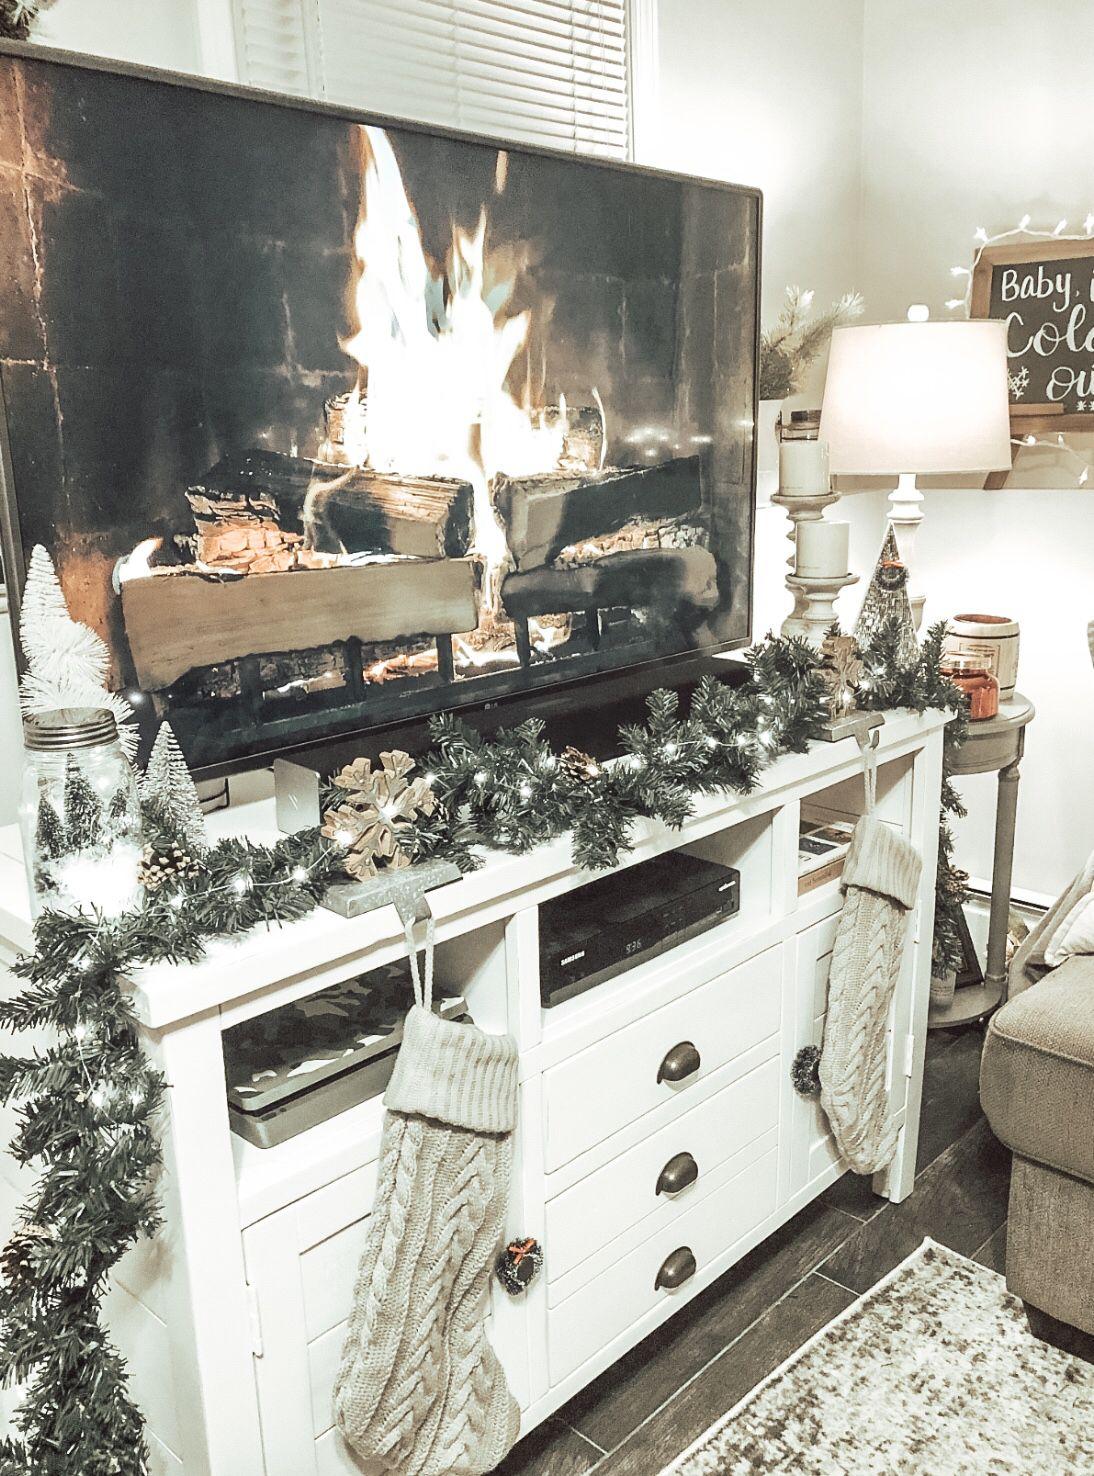 Tv stand Christmas decor, stockings, garland, twinkle lights